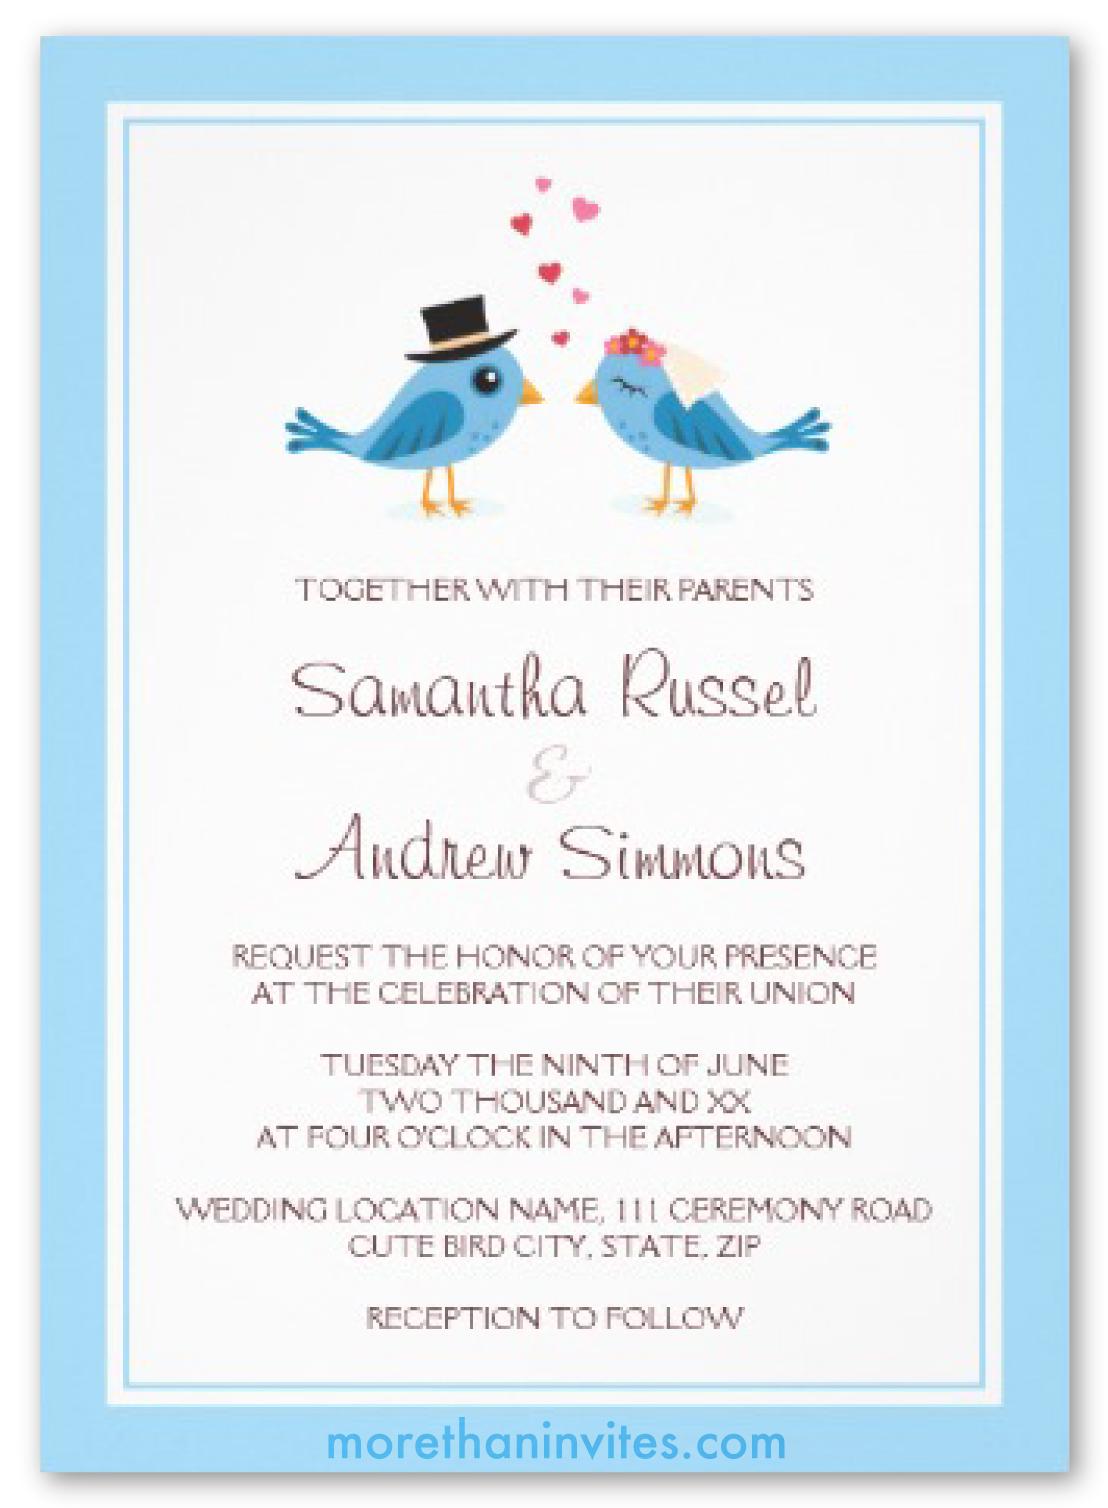 Cute Blue Bird Bride And Groom Wedding Invitation More